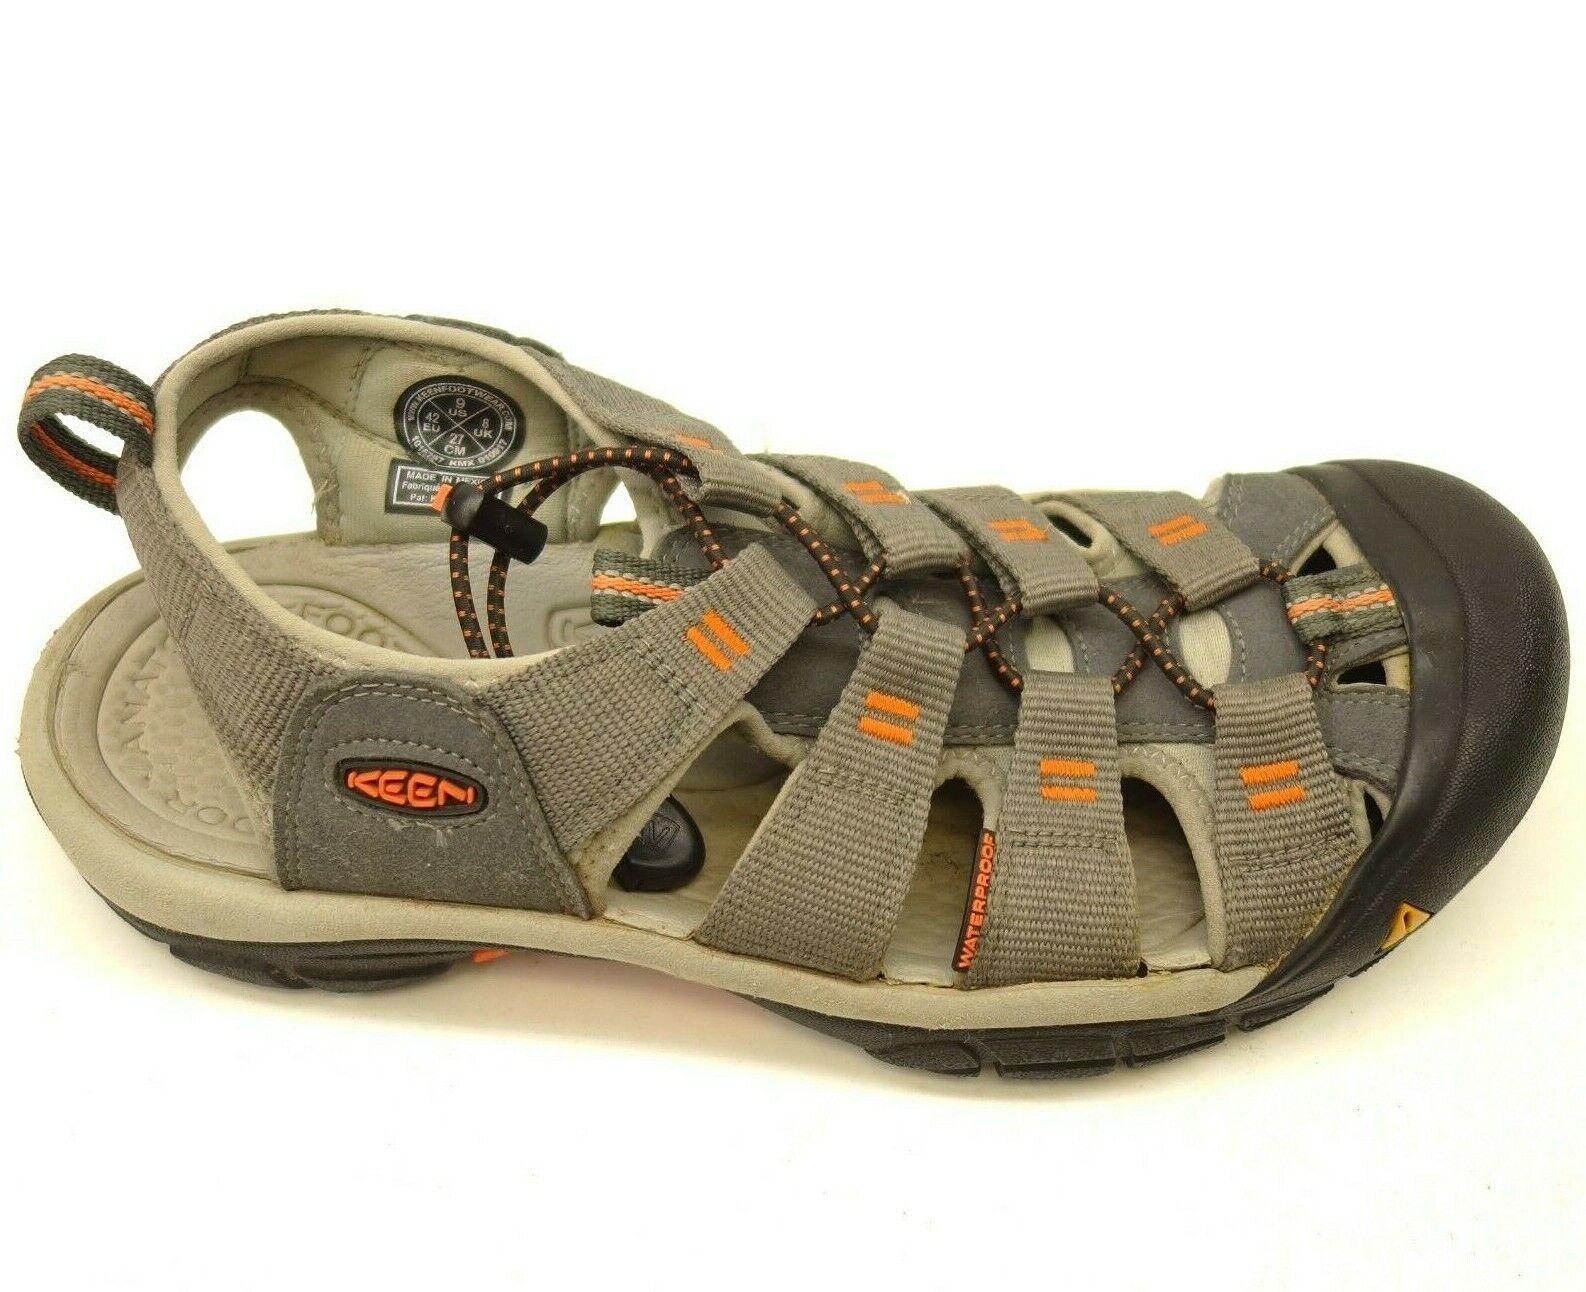 Keen Newport H2 US 9 Ue 42 gris Senderismo Sandalias para Caminar Agua